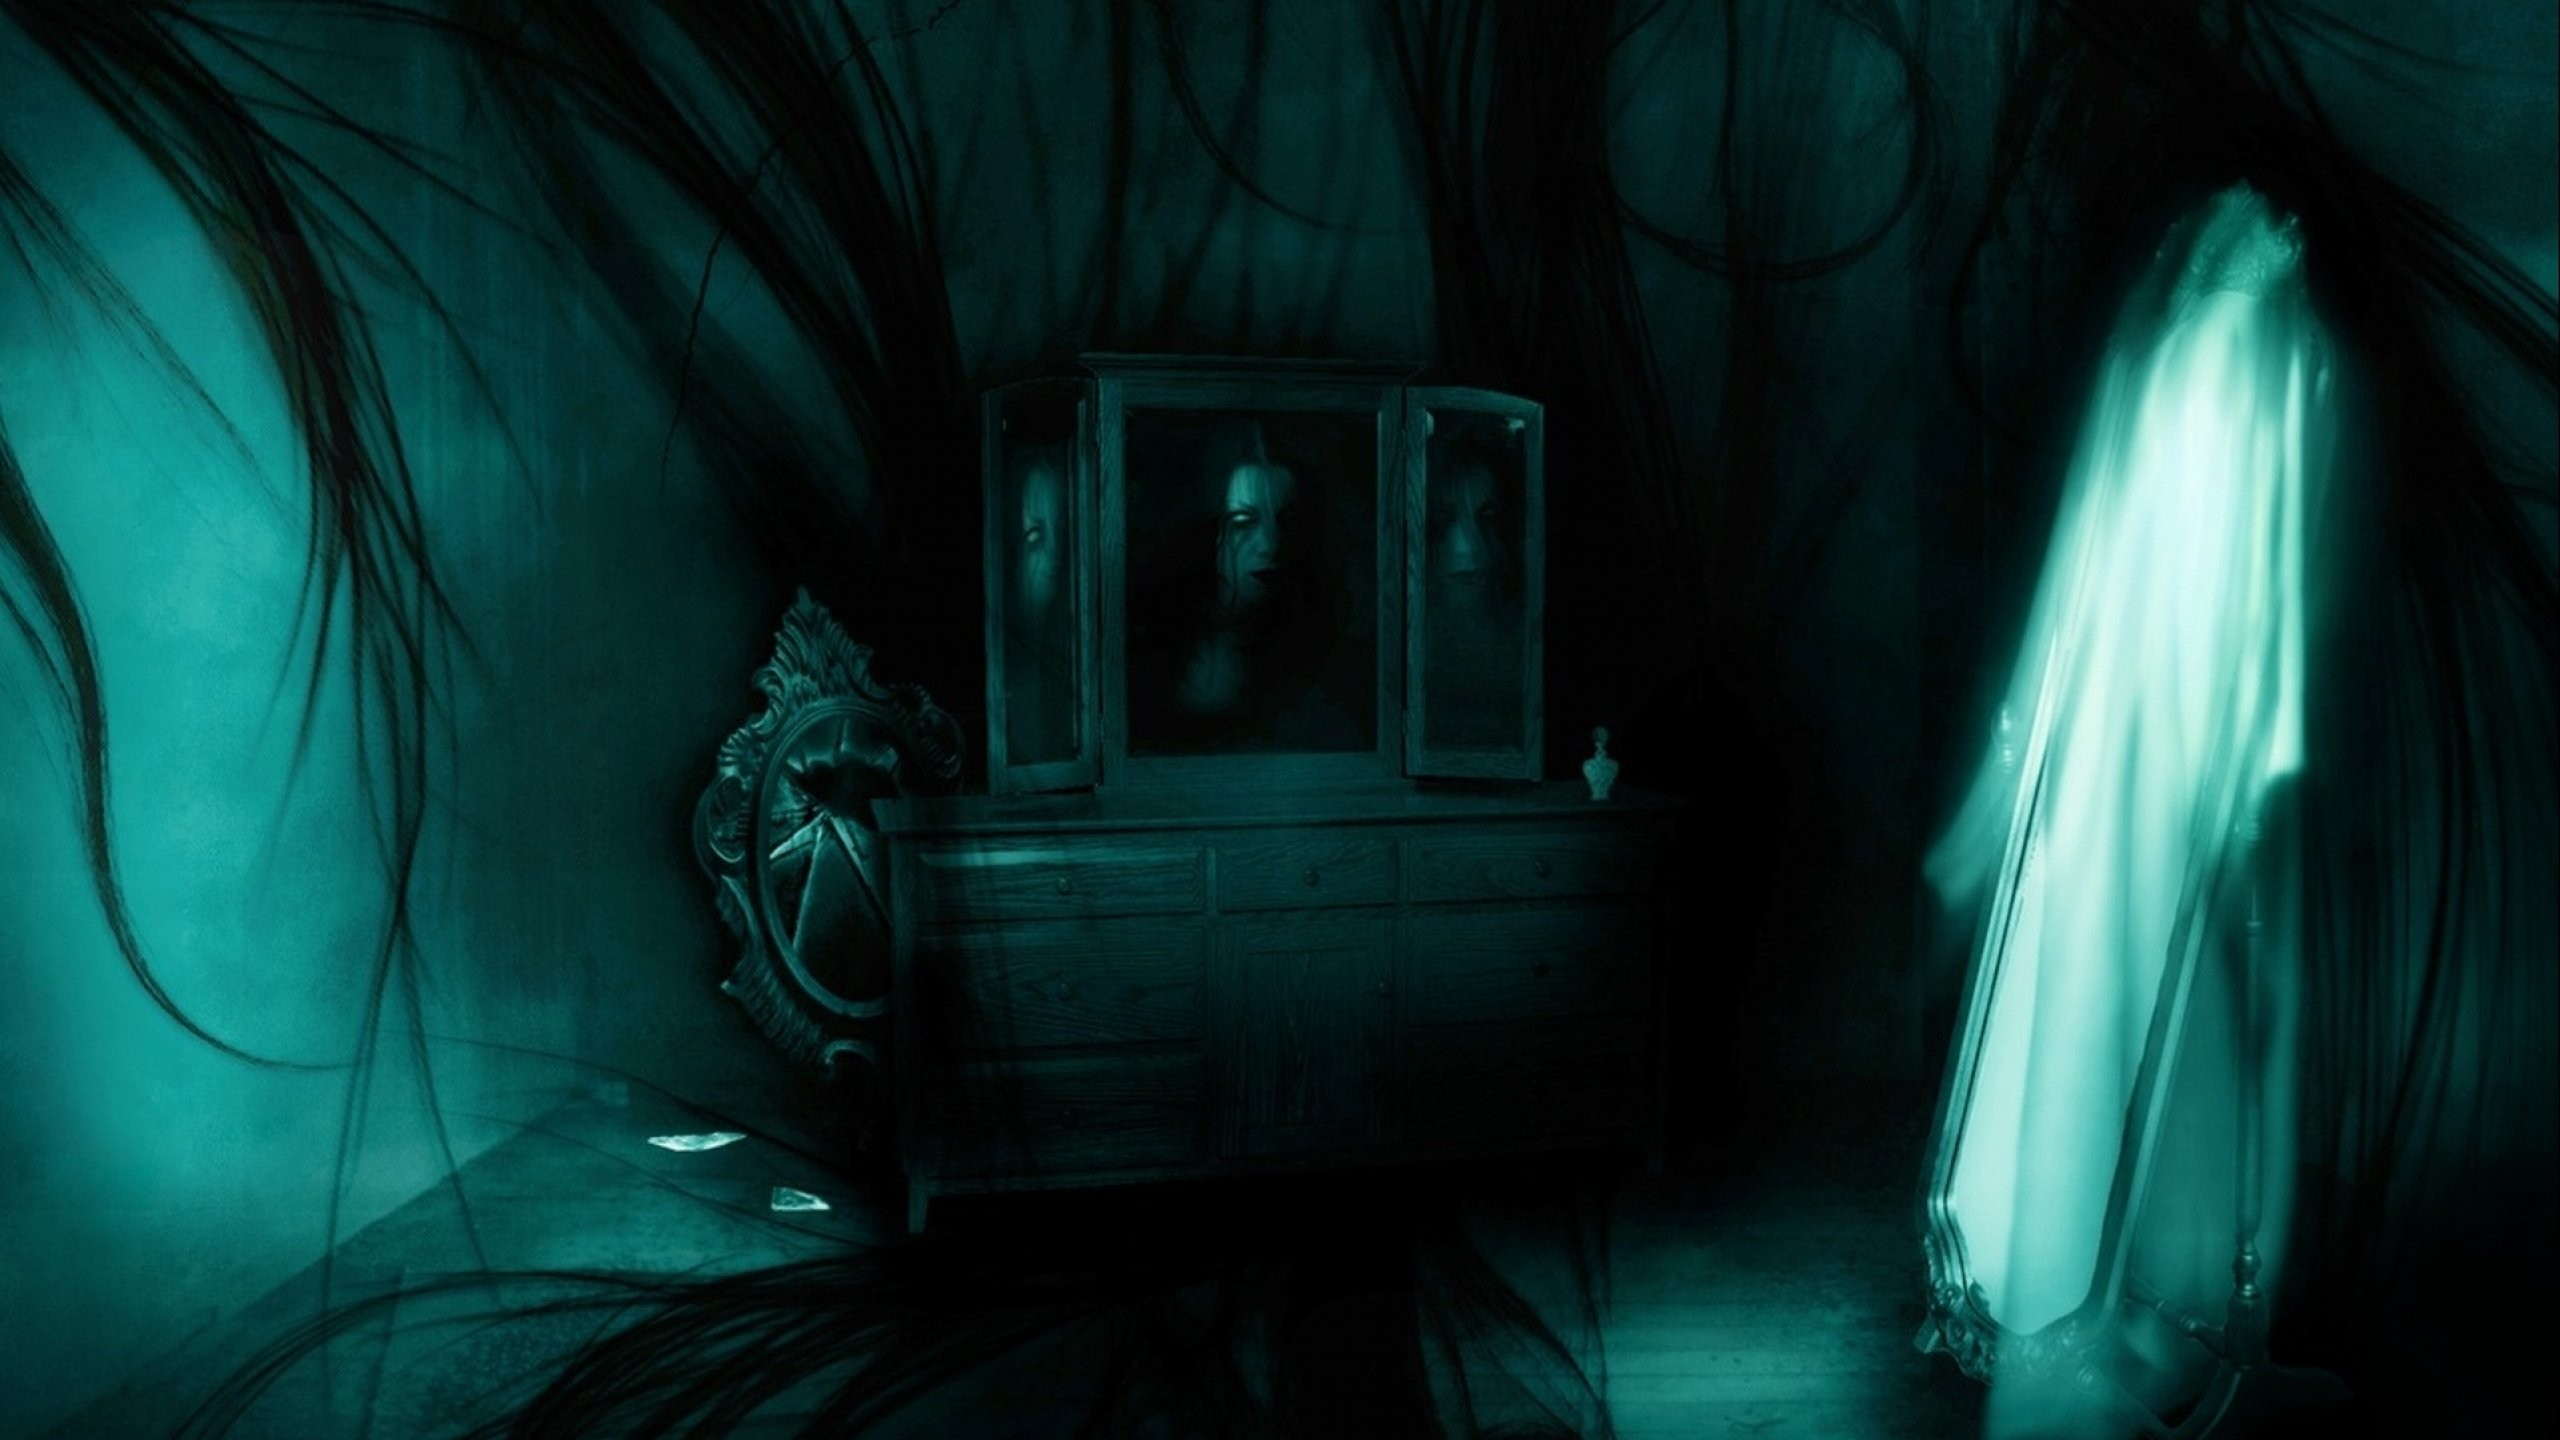 dark-ghost-fantasy-art-artwork-horror-spooky-creepy-halloween-gothic- wallpaper-1.jpg (2560×1440)   cool stuff   Pinterest   Creepy ghost, 3d  wallpaper and …